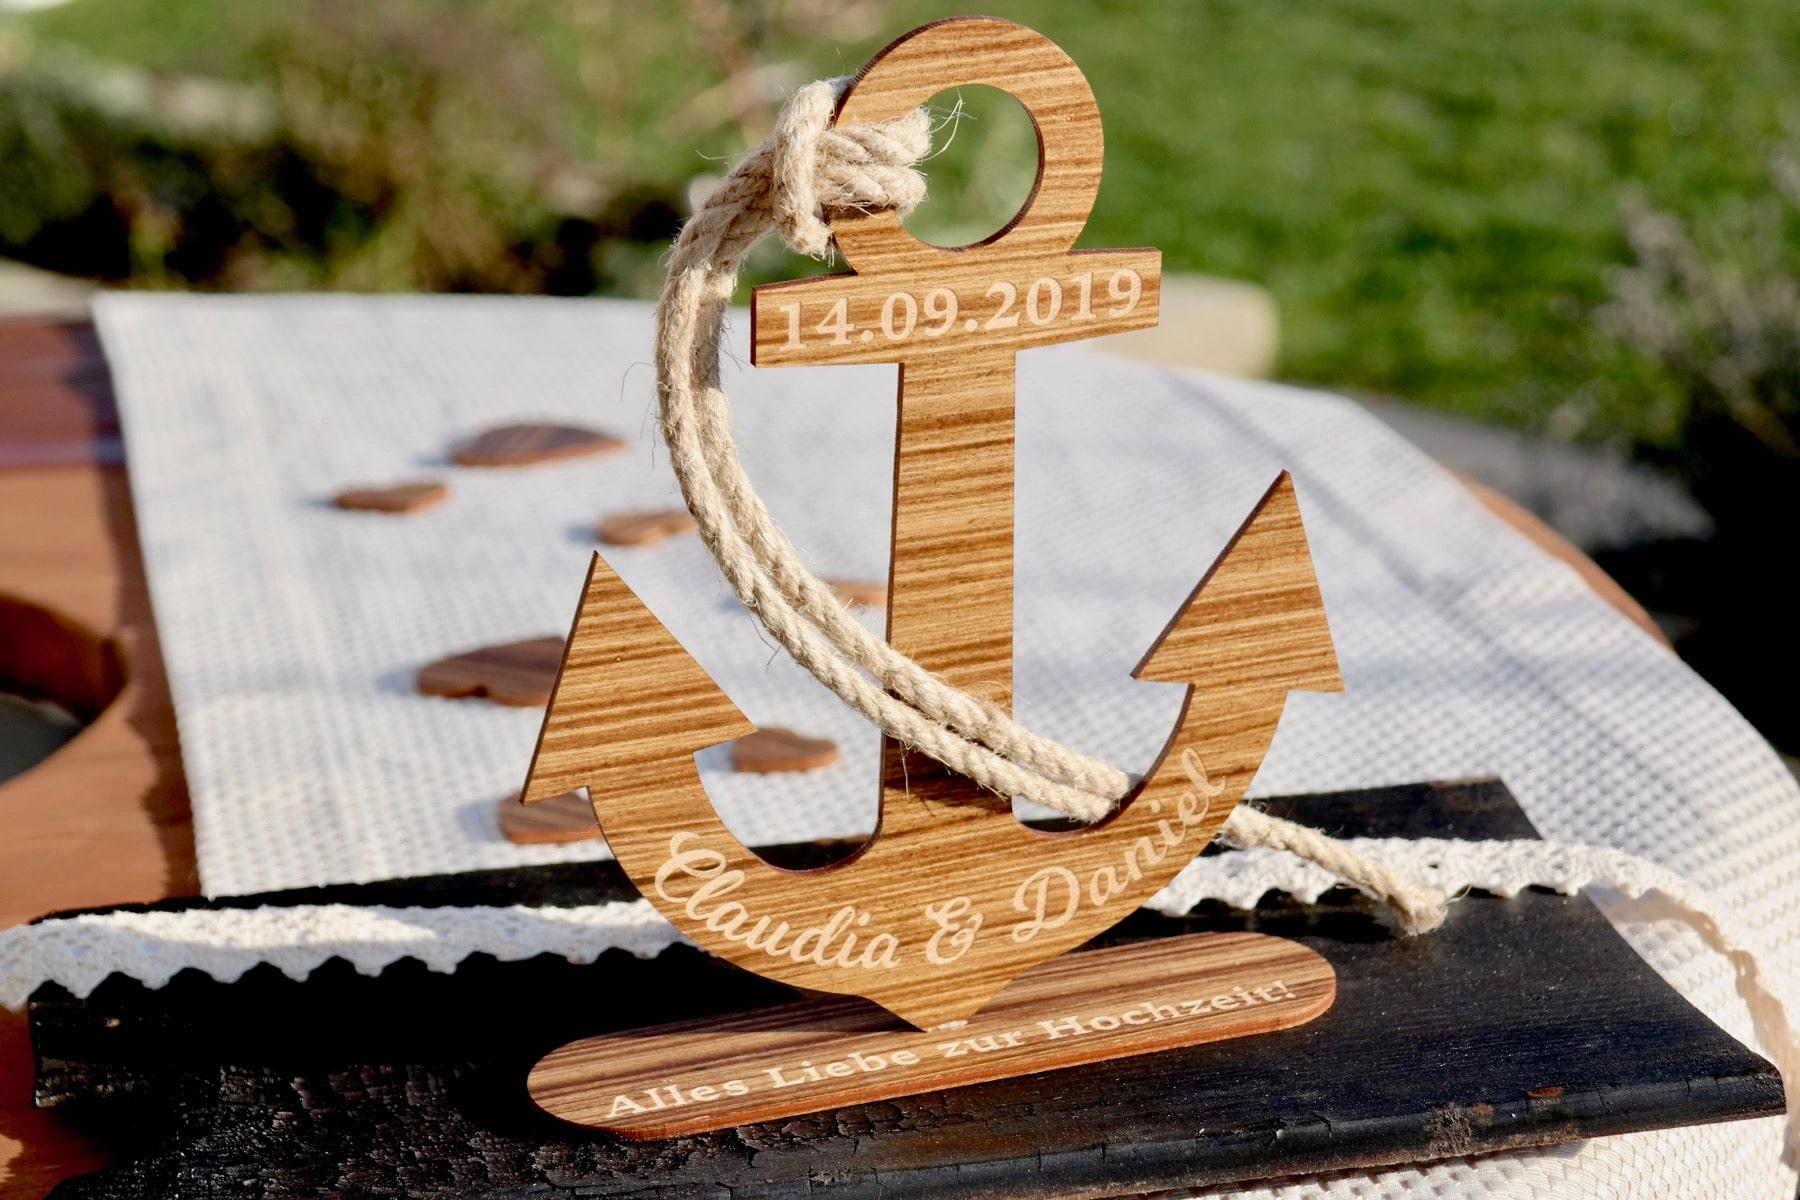 Hochzeit Geschenk Holz Anker